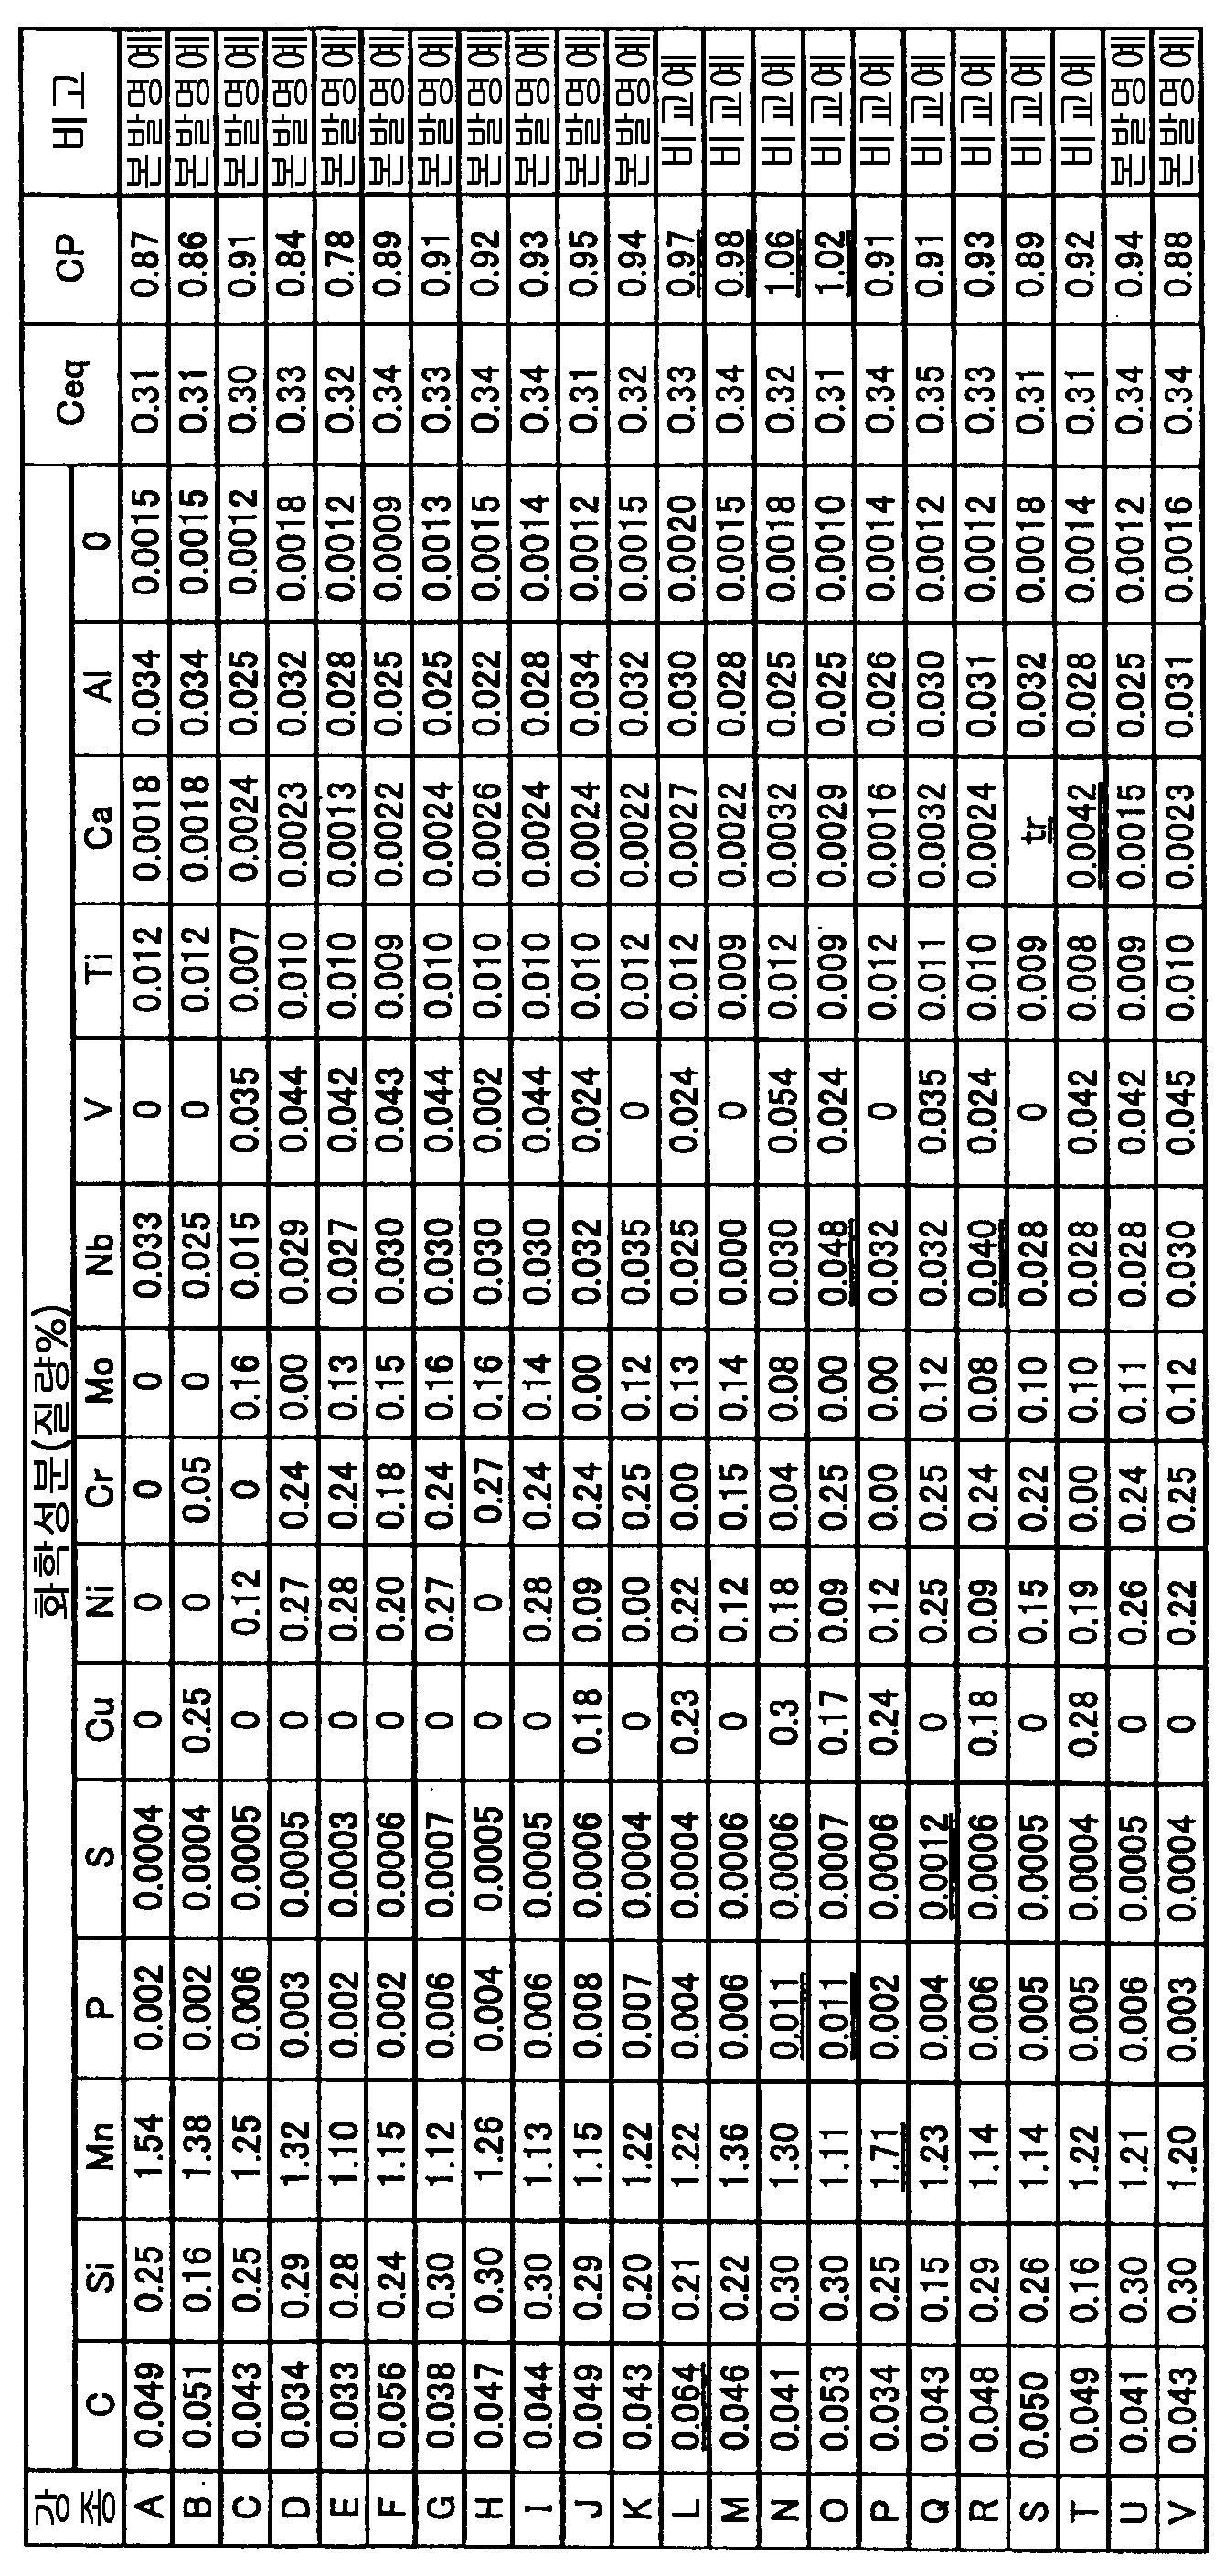 Figure 112010028770313-pct00001